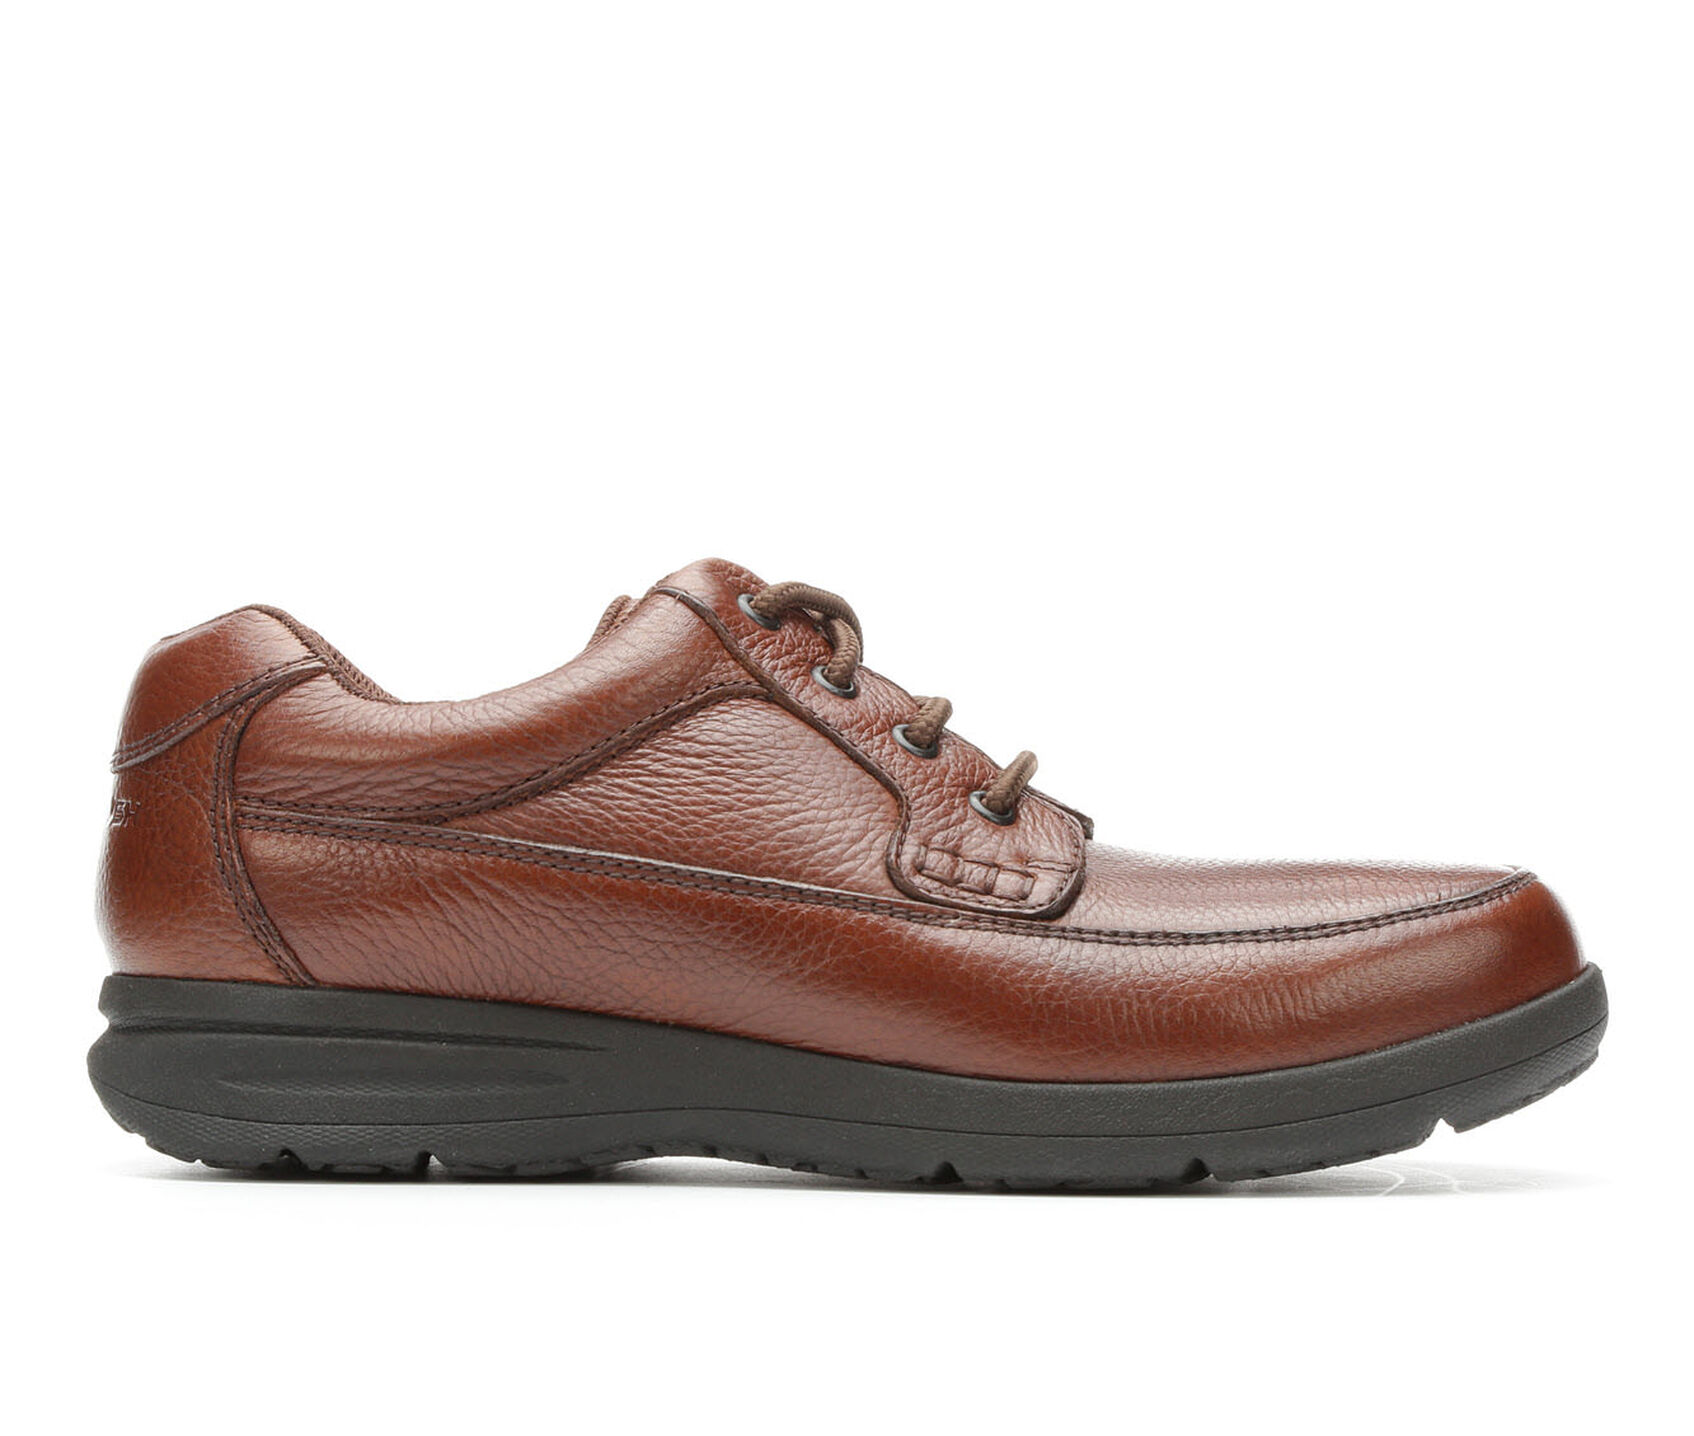 a28cbd182a381 Images. Men  39 s Nunn Bush Cam Moc Toe Ox Casual Shoes